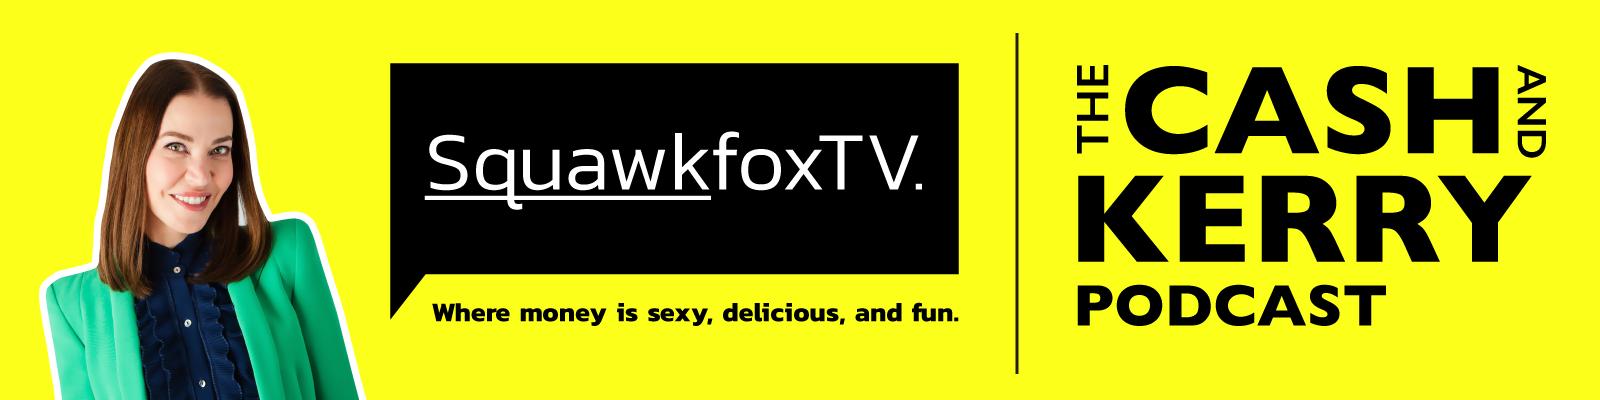 SquawkfoxTV